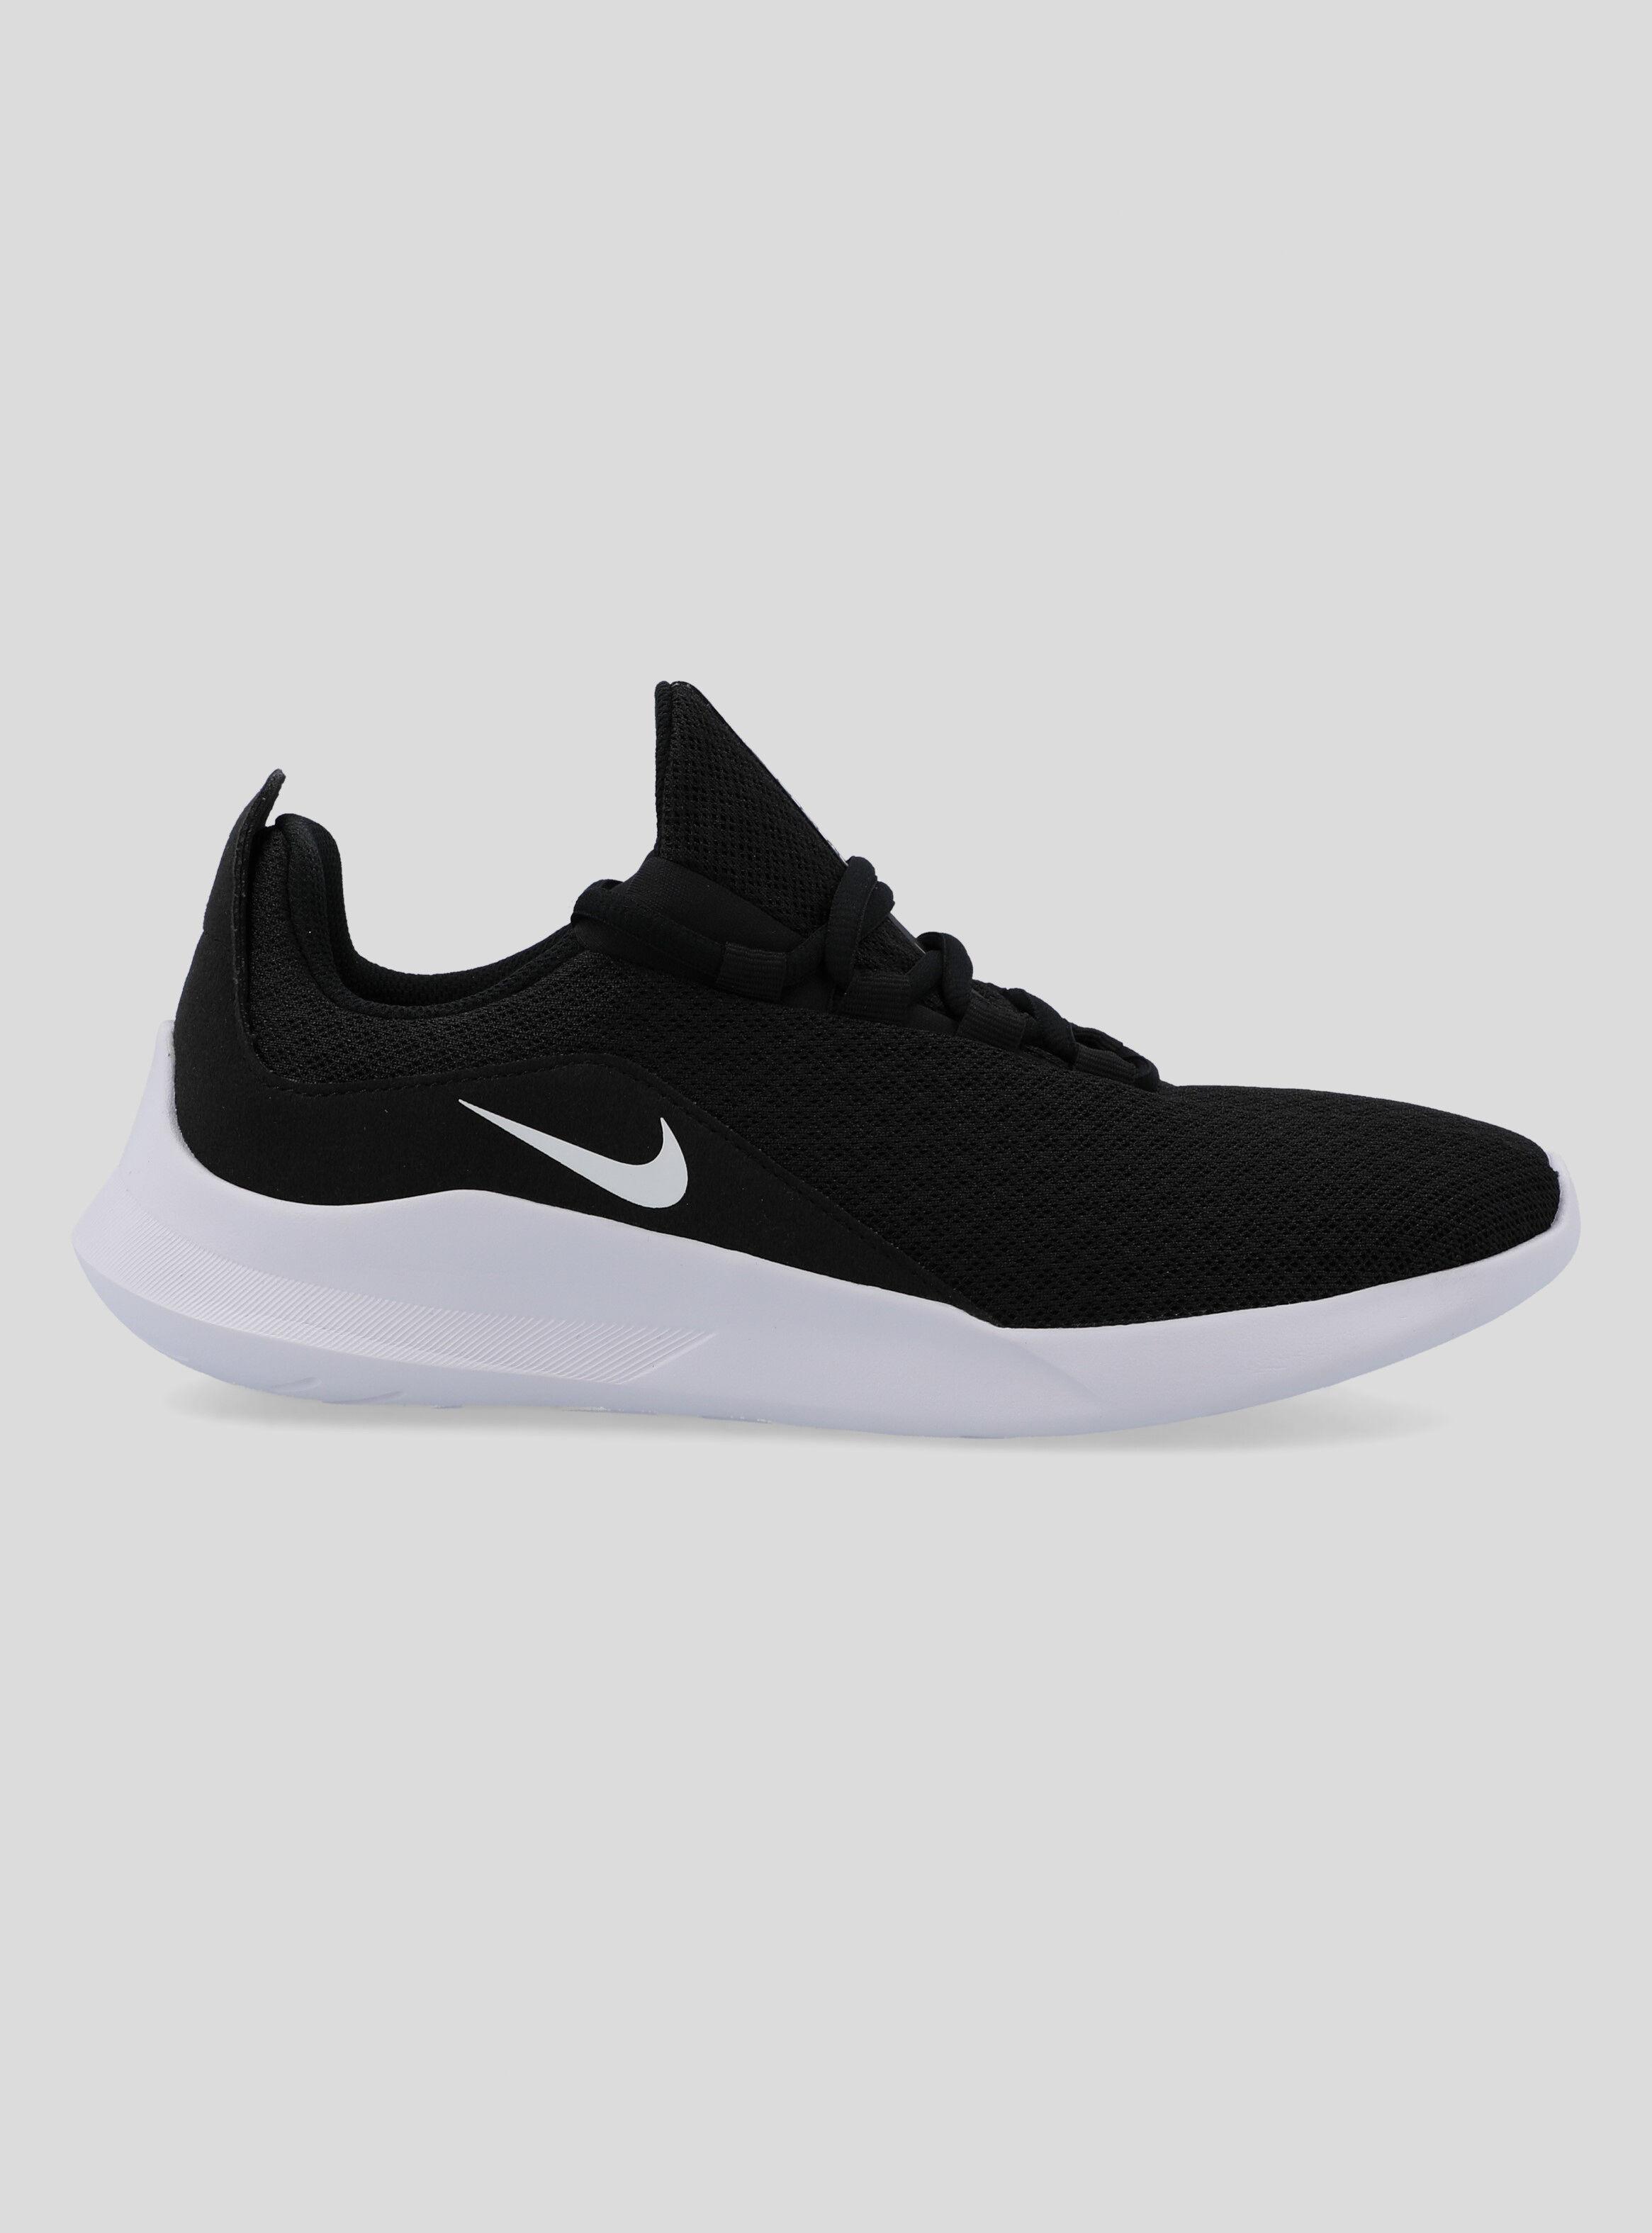 Zapatilla Nike Viale Urbana Hombre